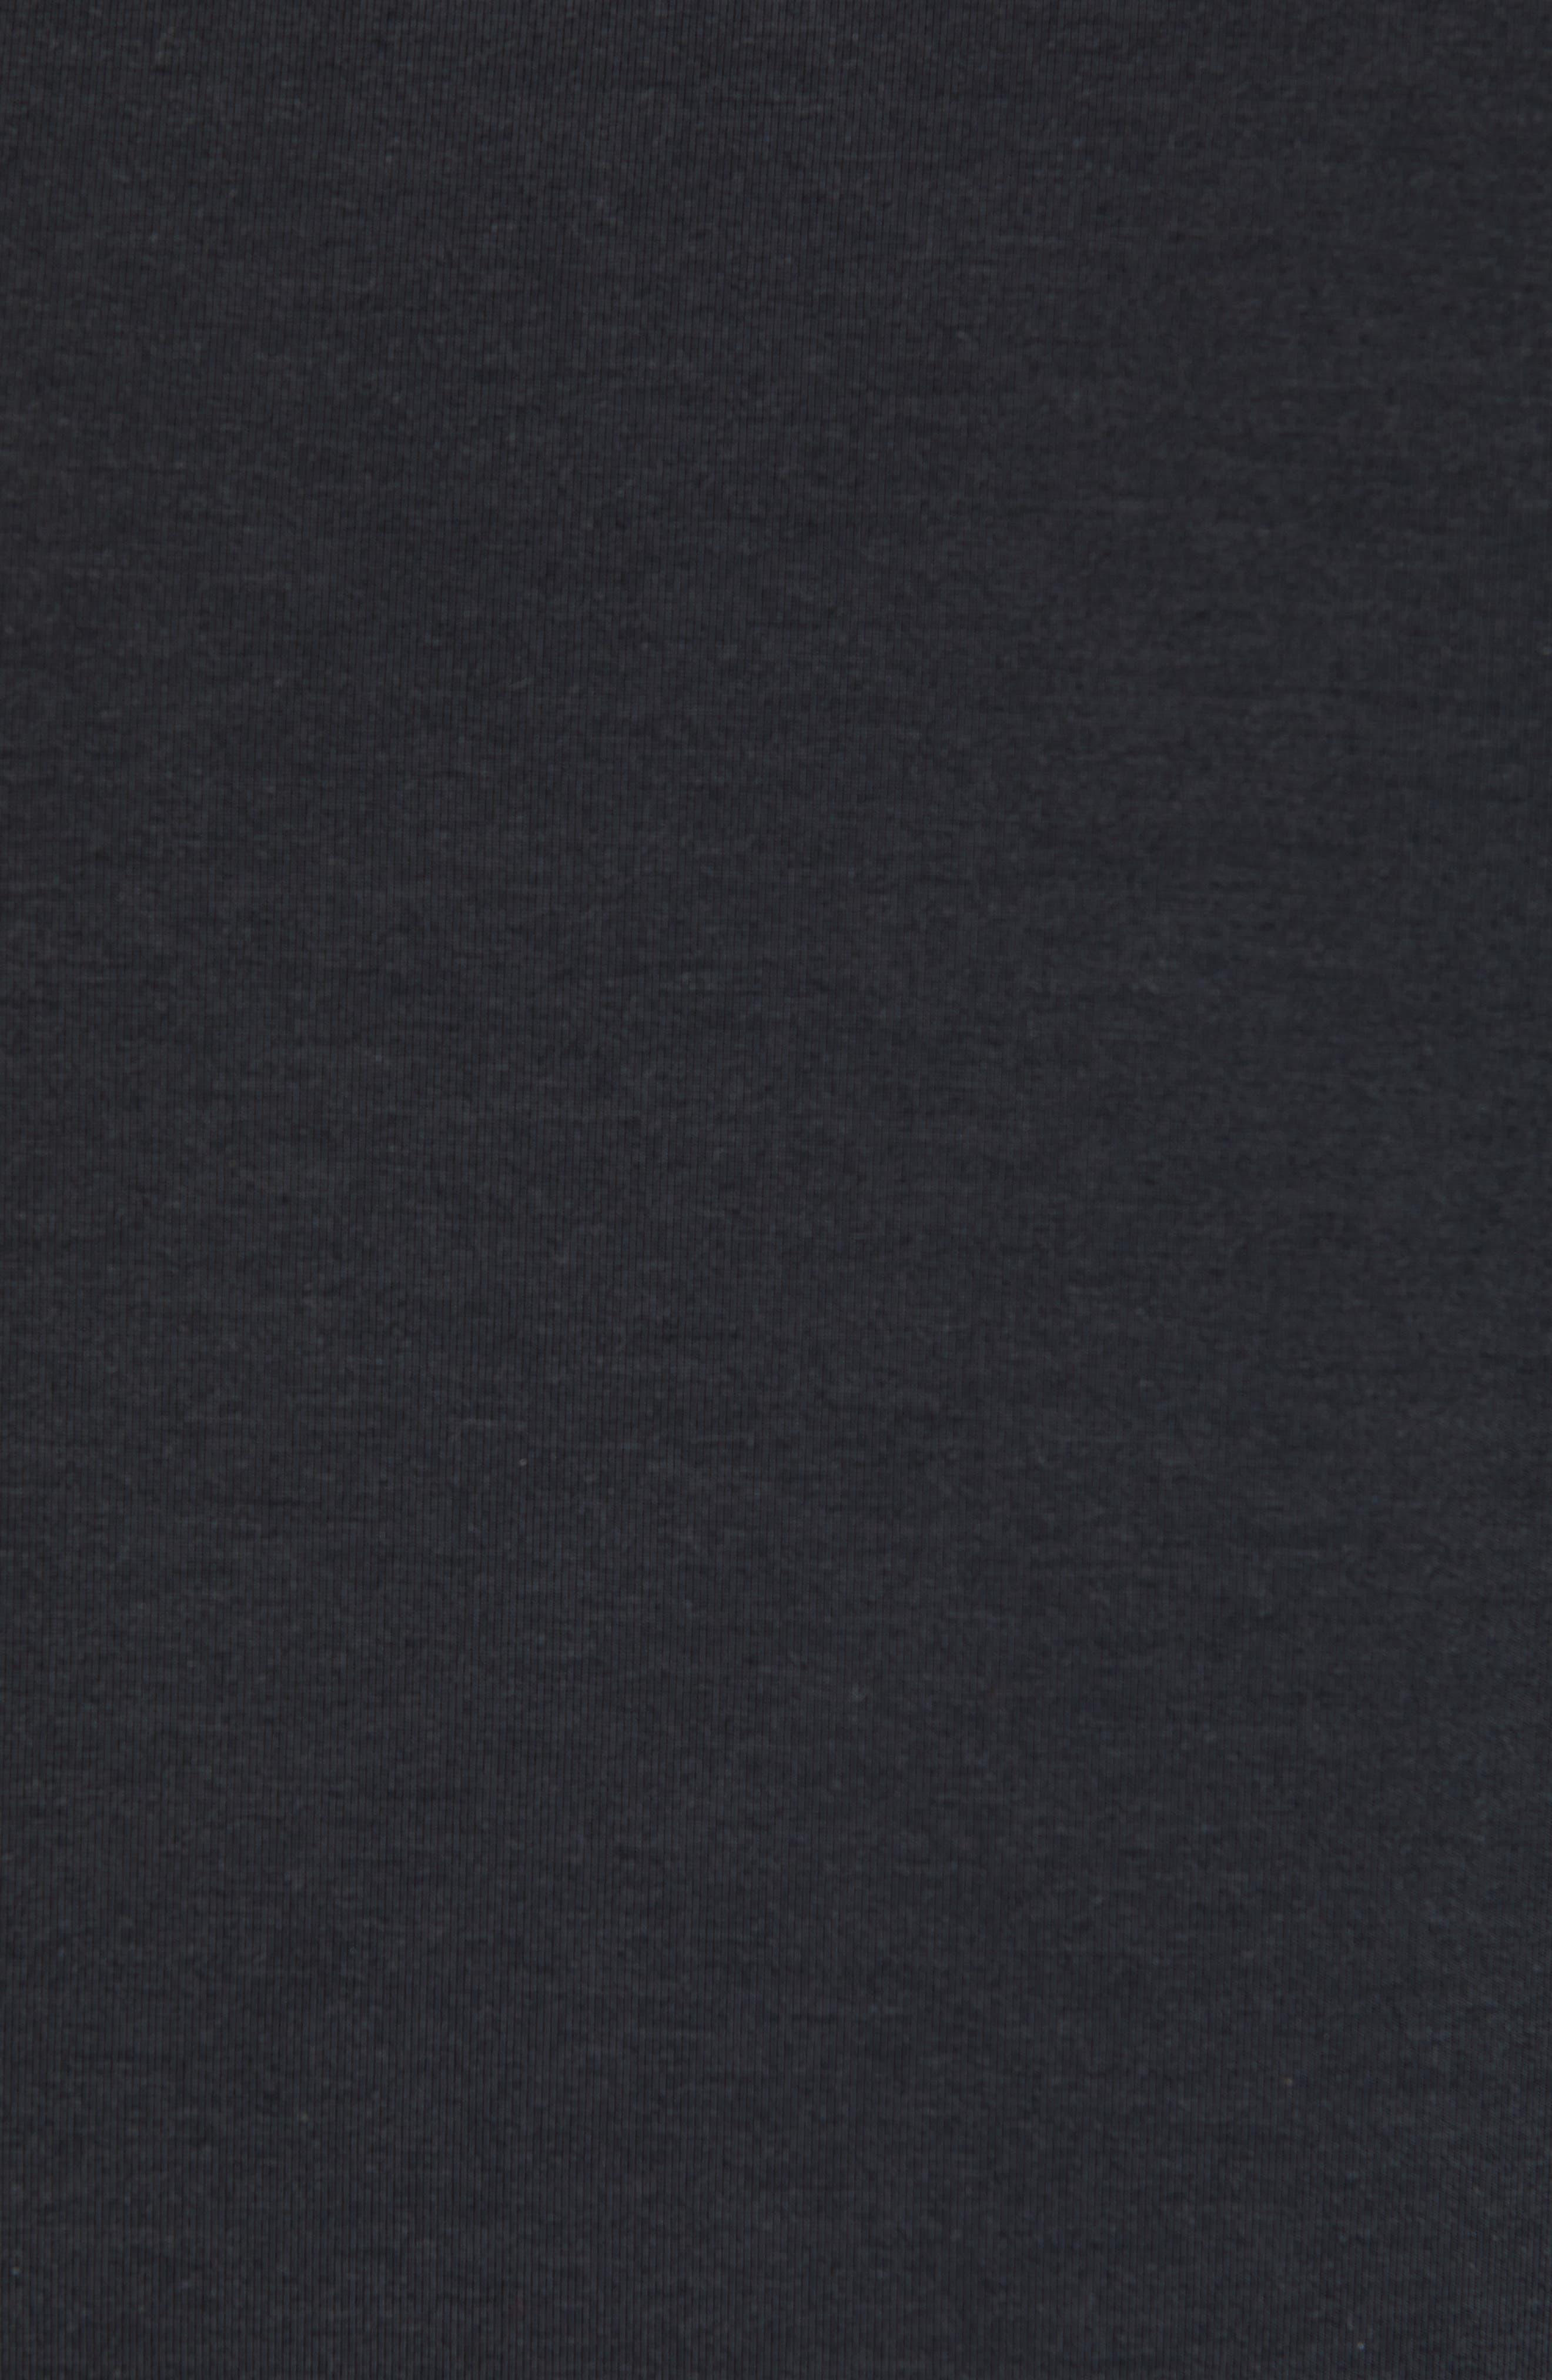 NIKE, Dry Transcent Sleeveless T-Shirt, Alternate thumbnail 5, color, BLACK/ DARK GREY